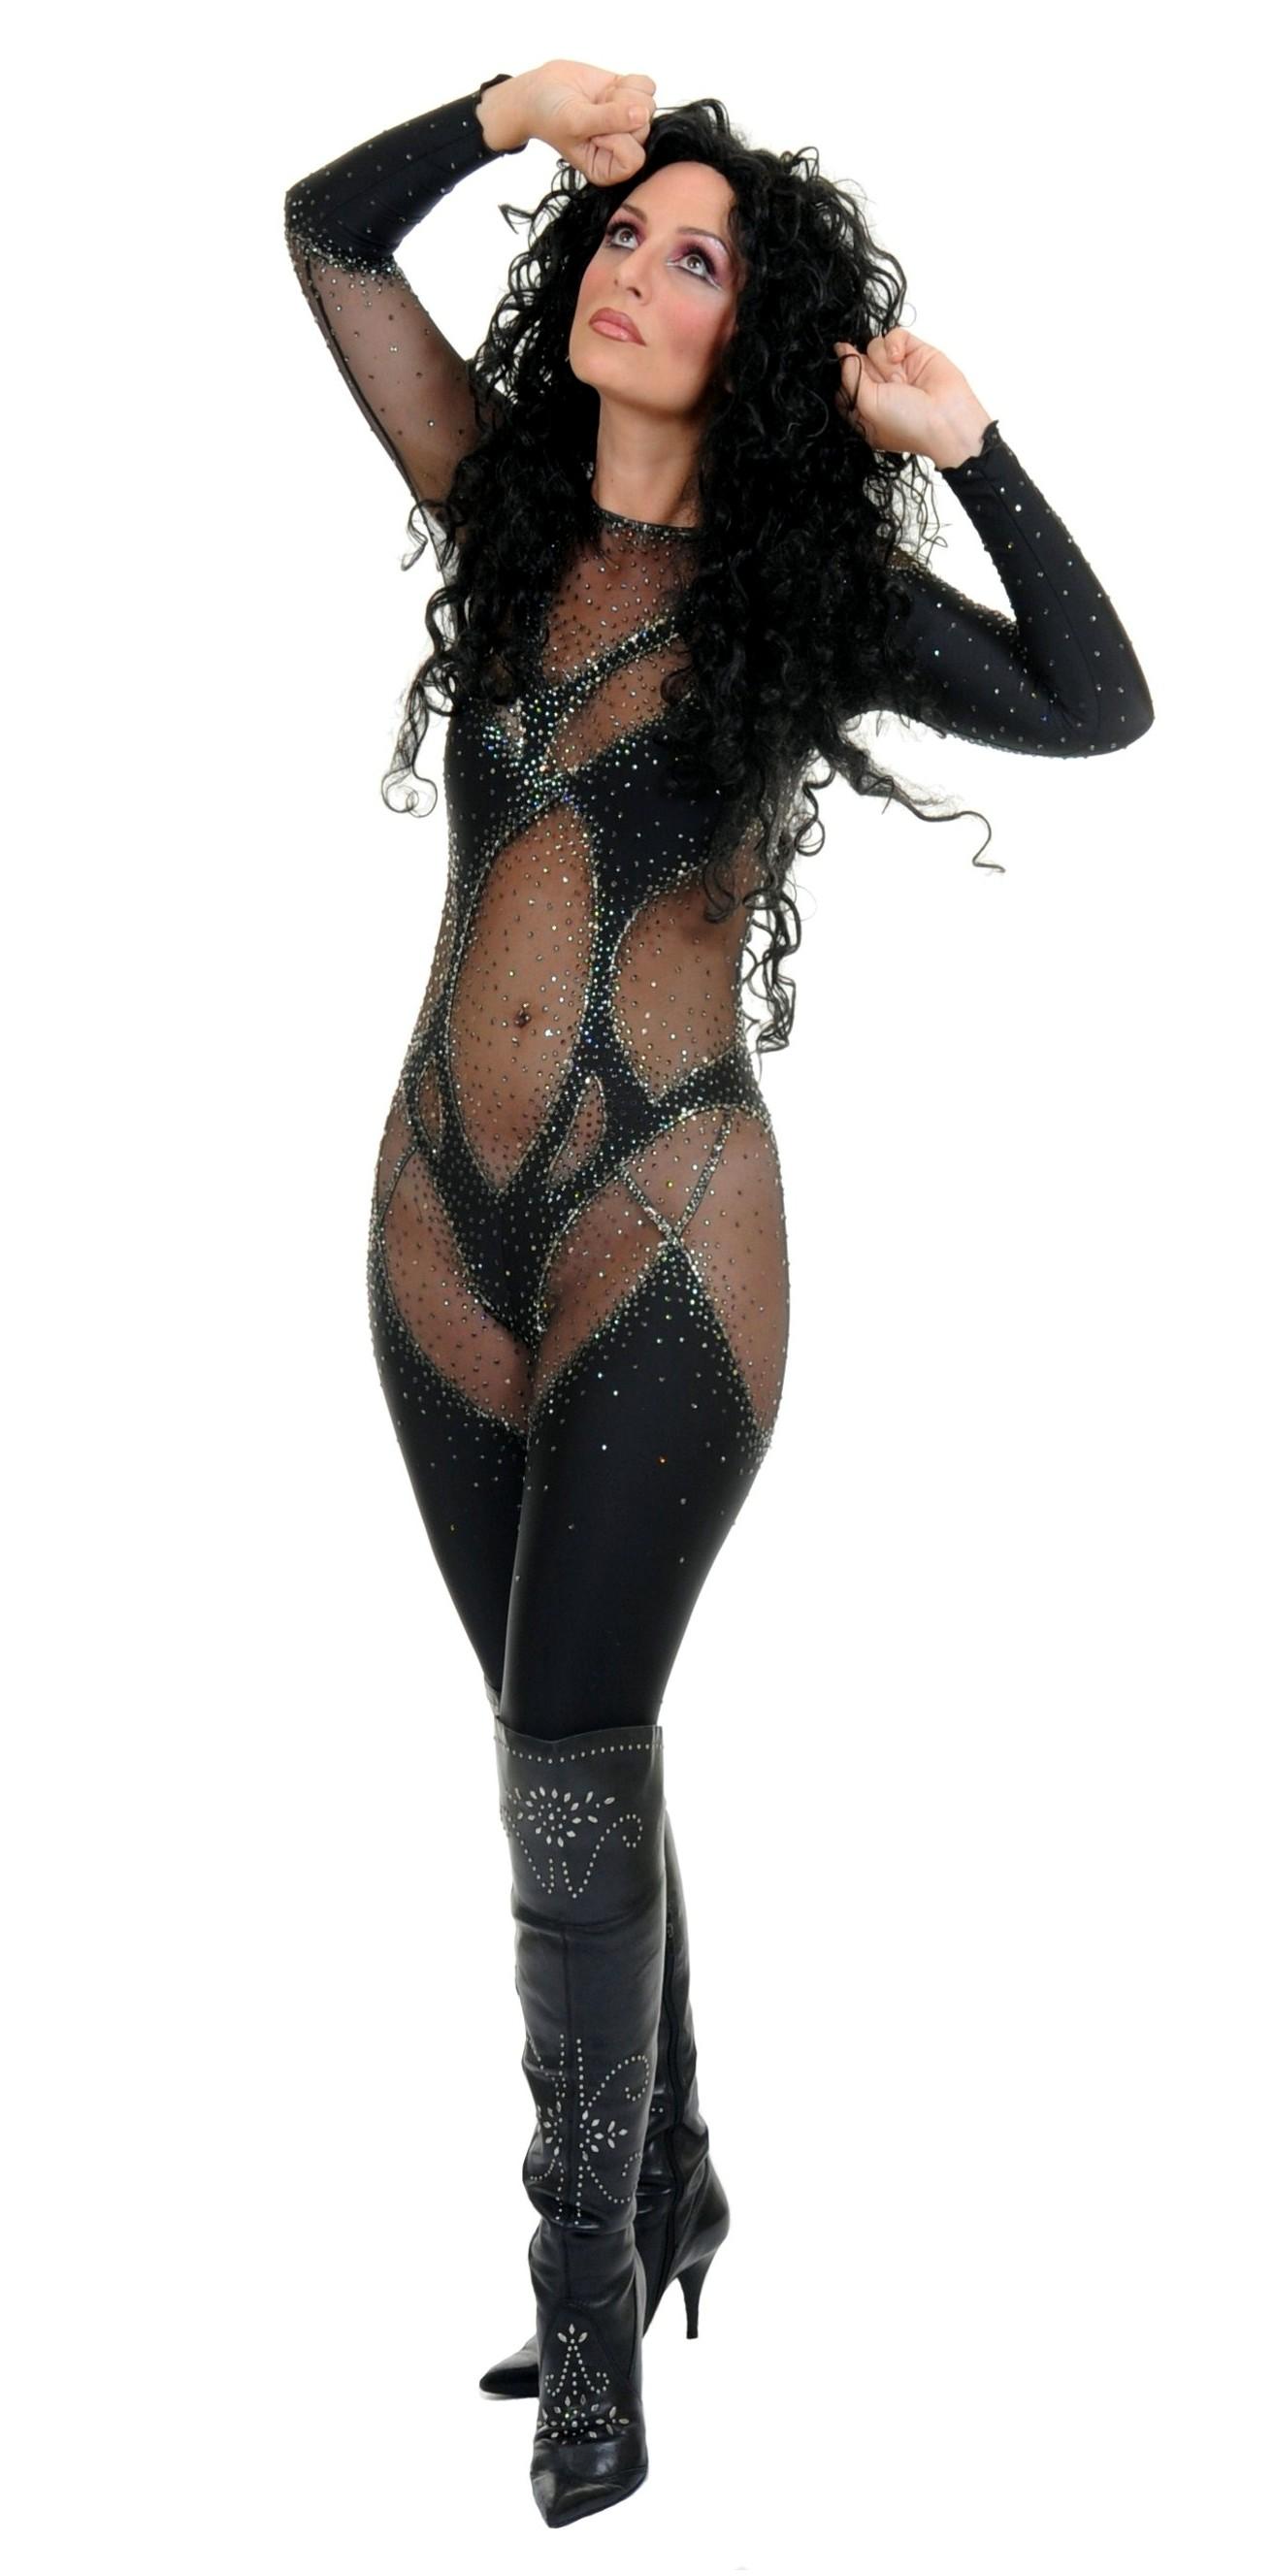 Cher 80 Jpg Flaming Fun Event Entertainment Agent